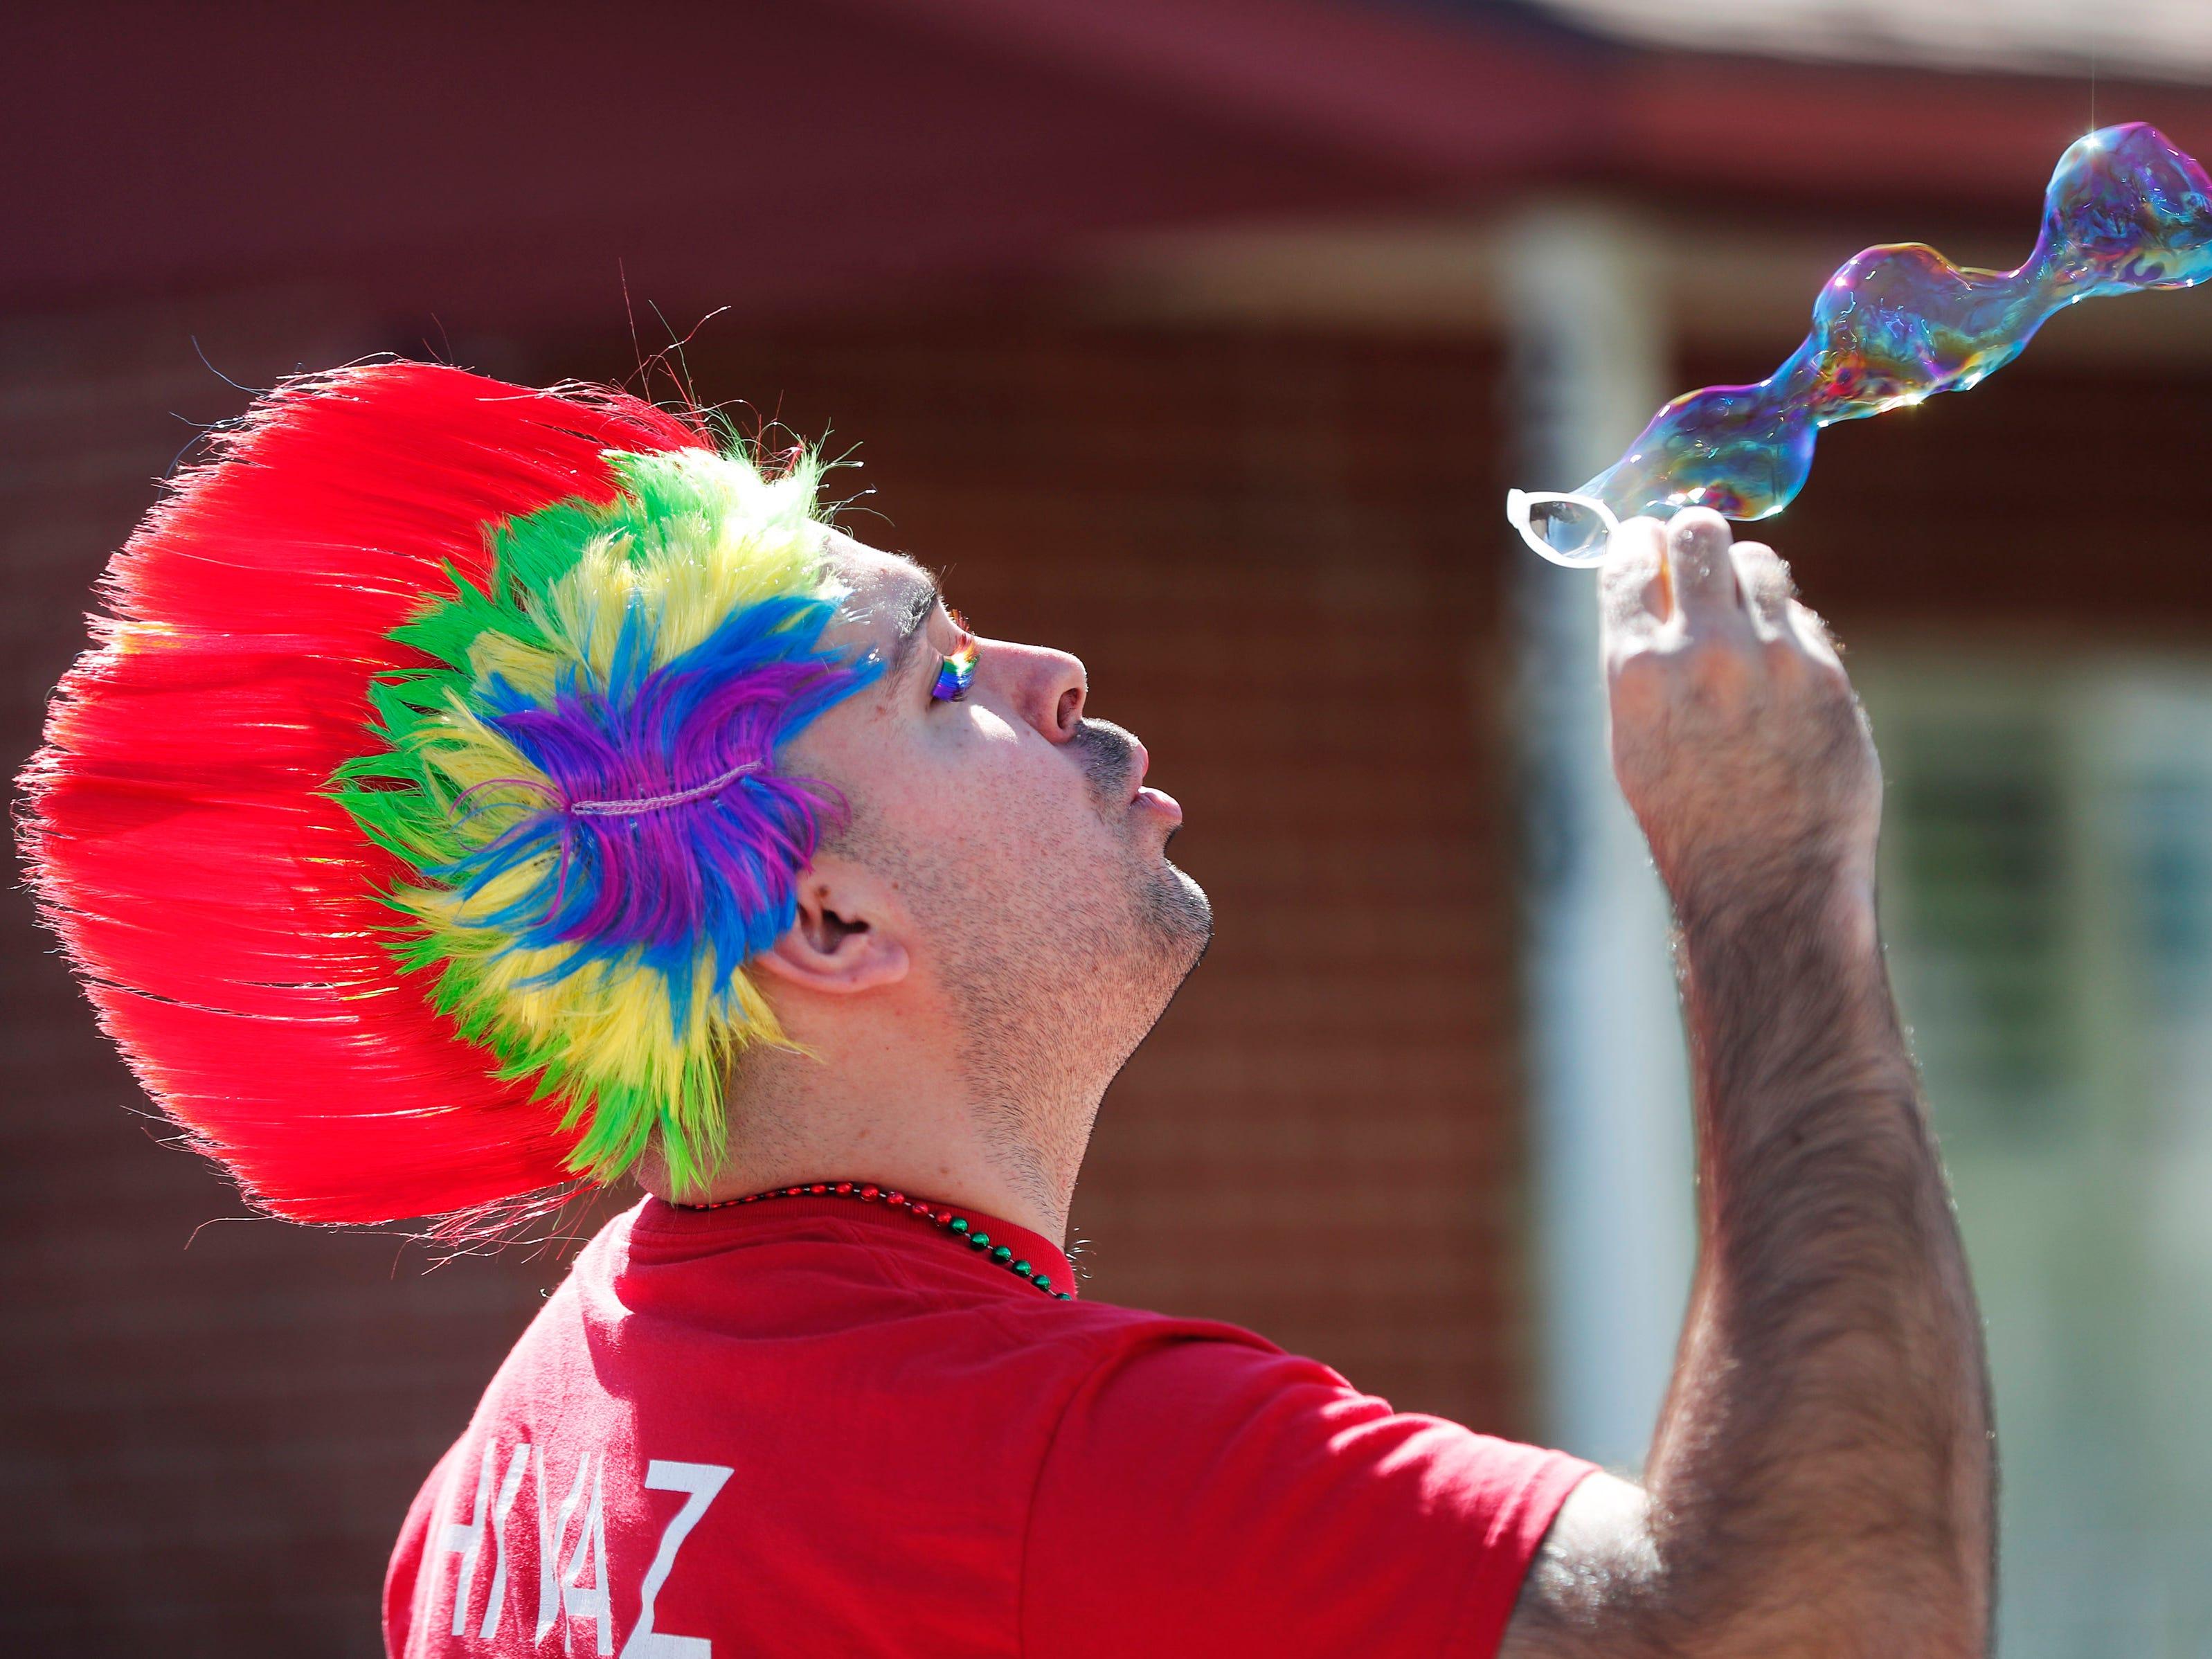 Mathew Scandin flows bubbles during the Phoenix Pride Parade on April 7, 2019.